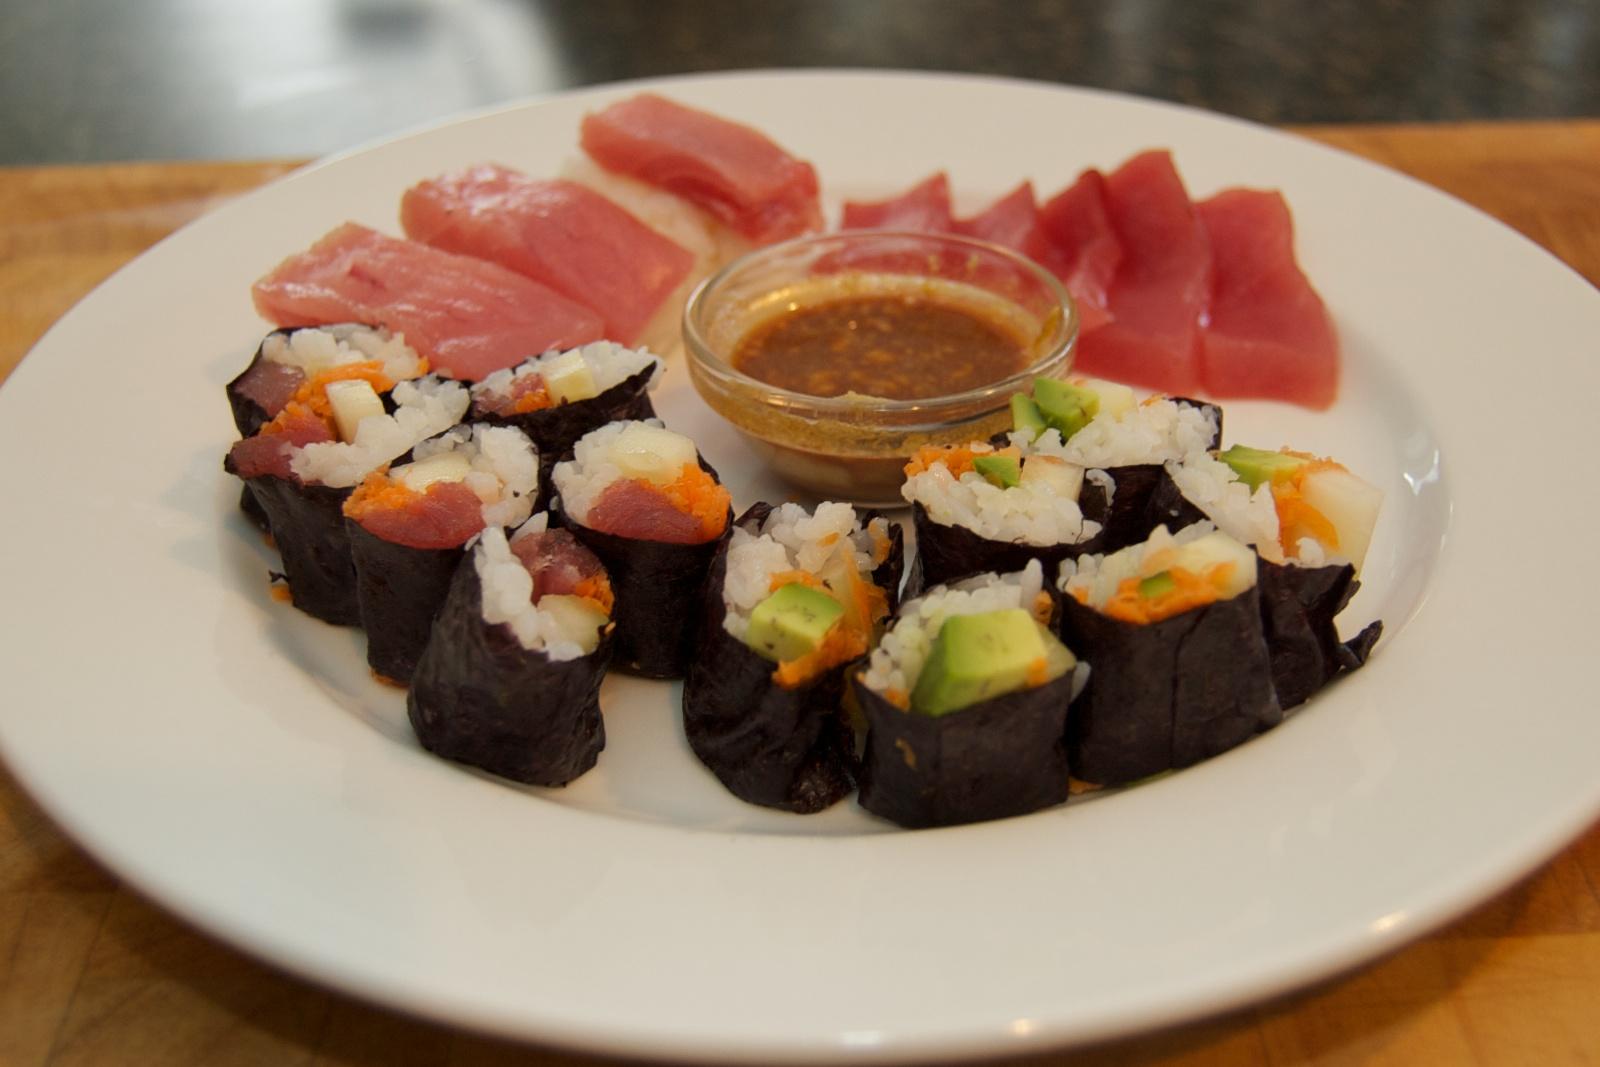 http://blog.rickk.com/food/2010/10/26/sushi1.jpg